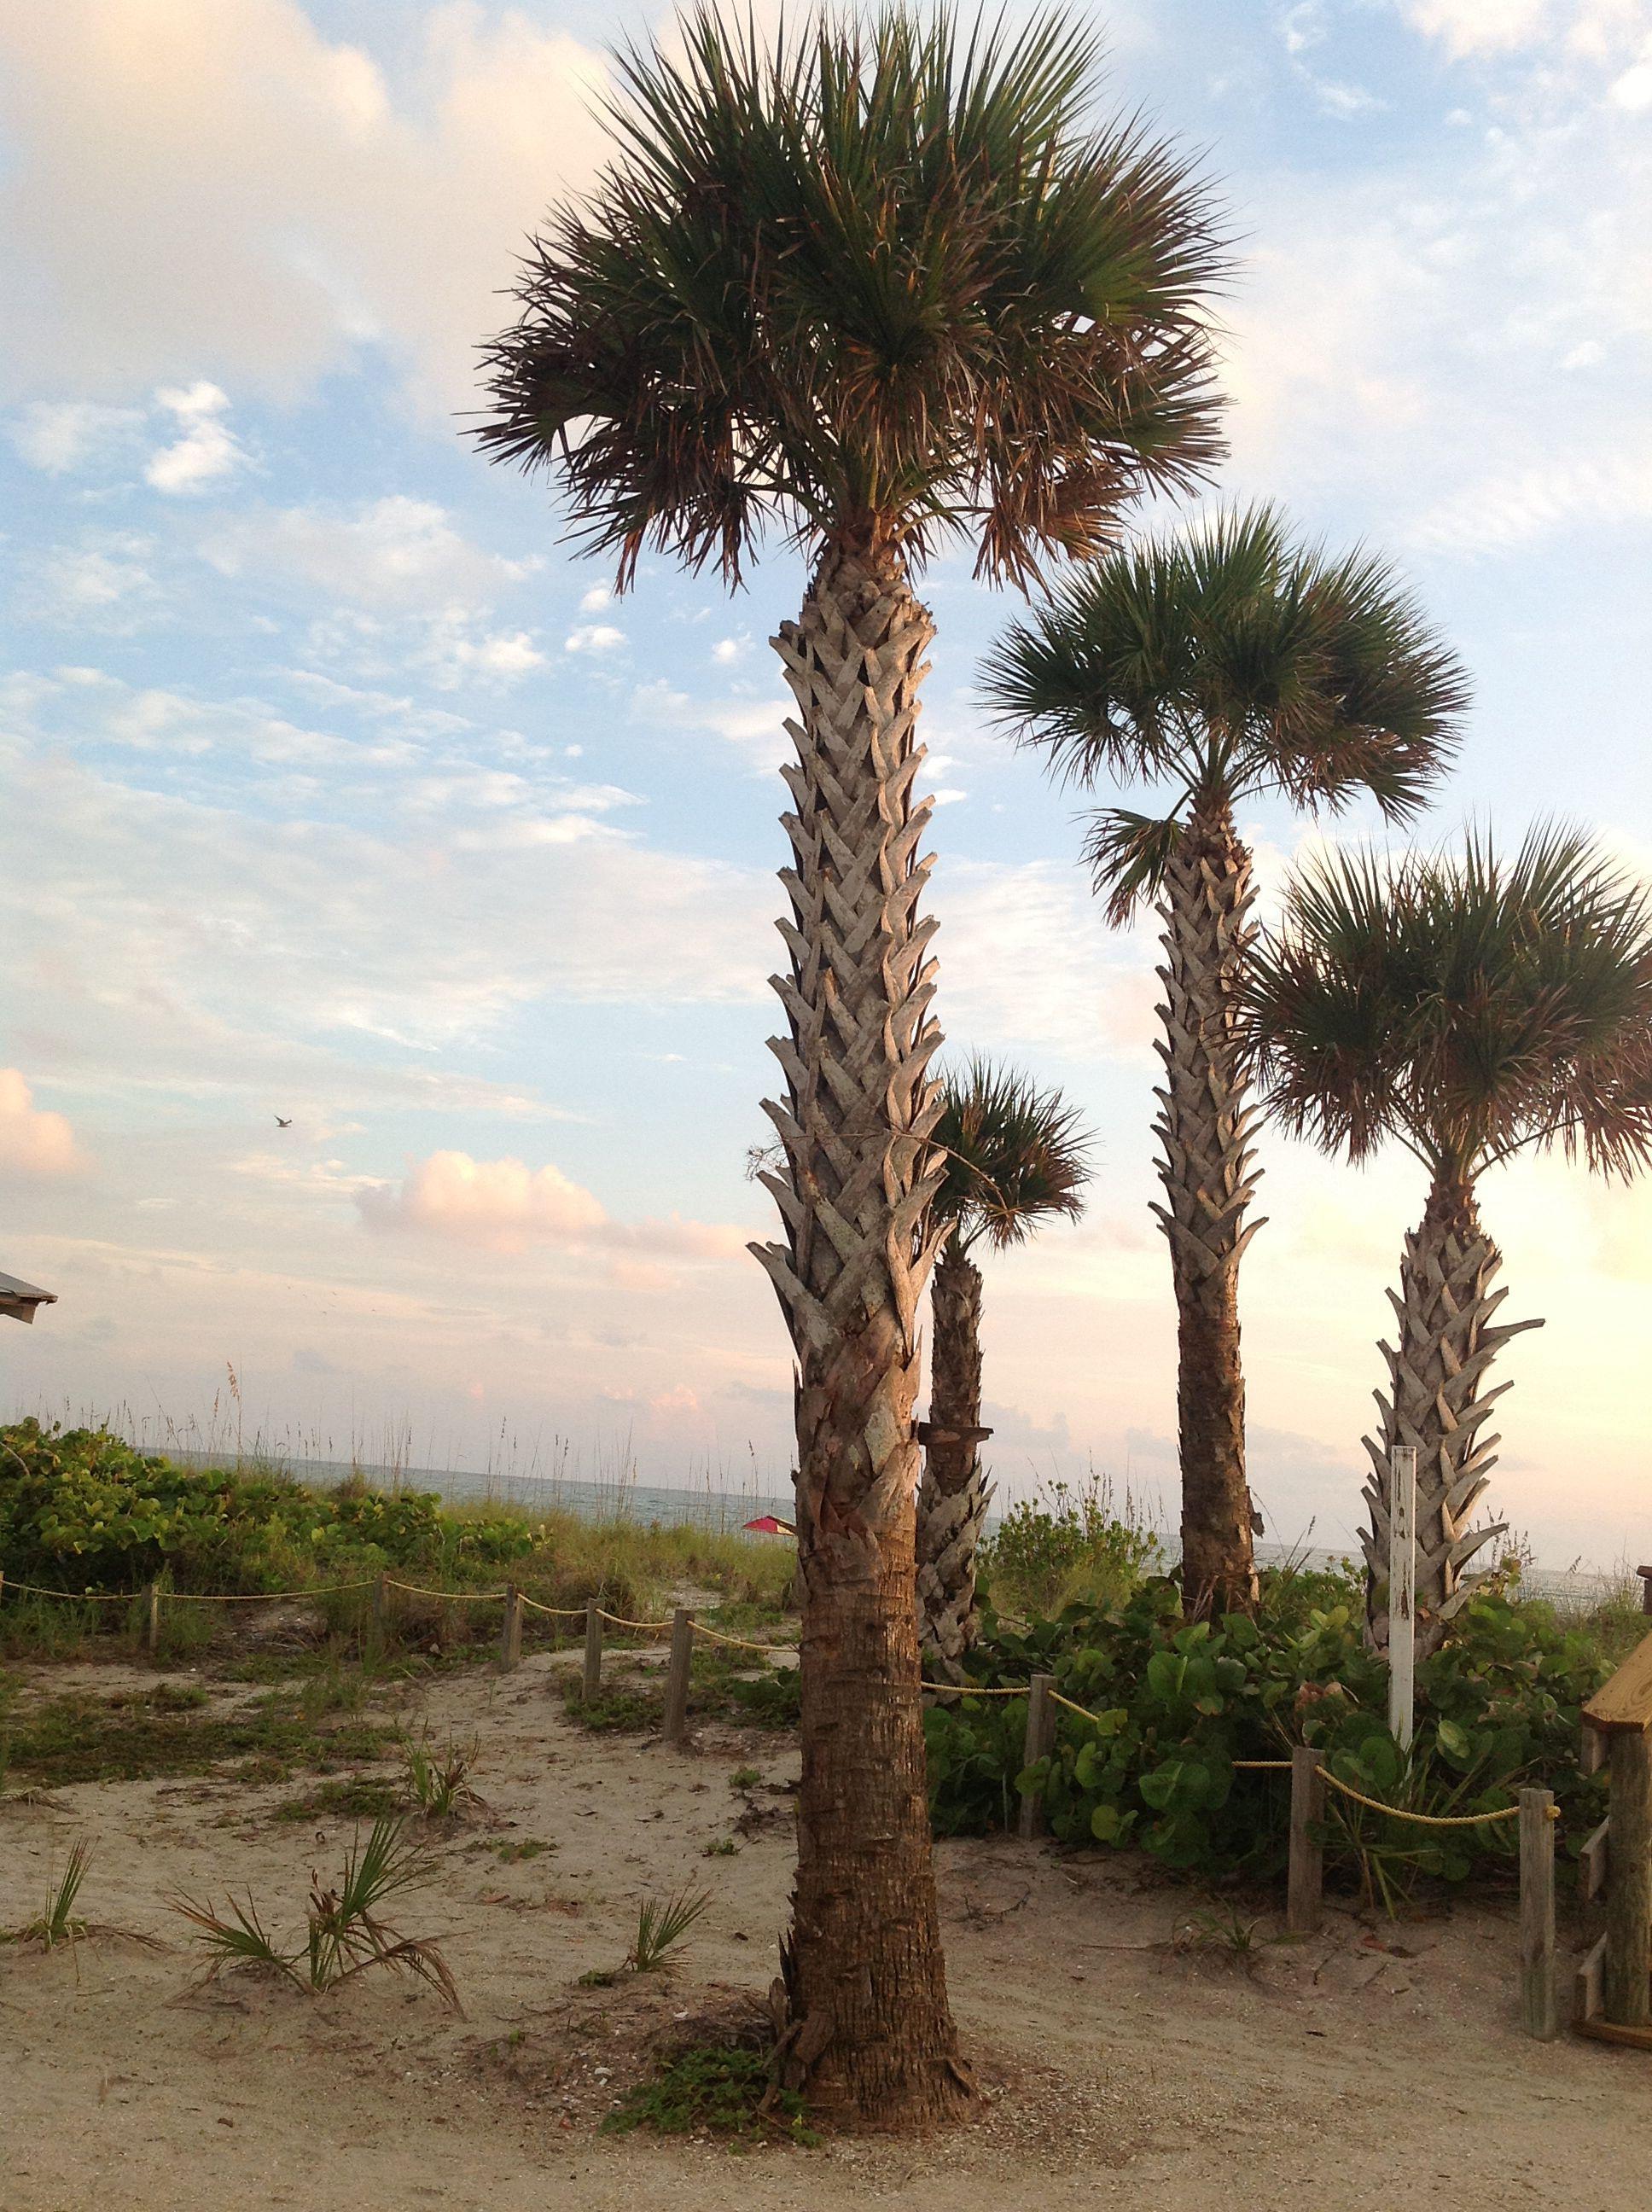 Manasota Key | Florida attractions, Manasota key florida ...